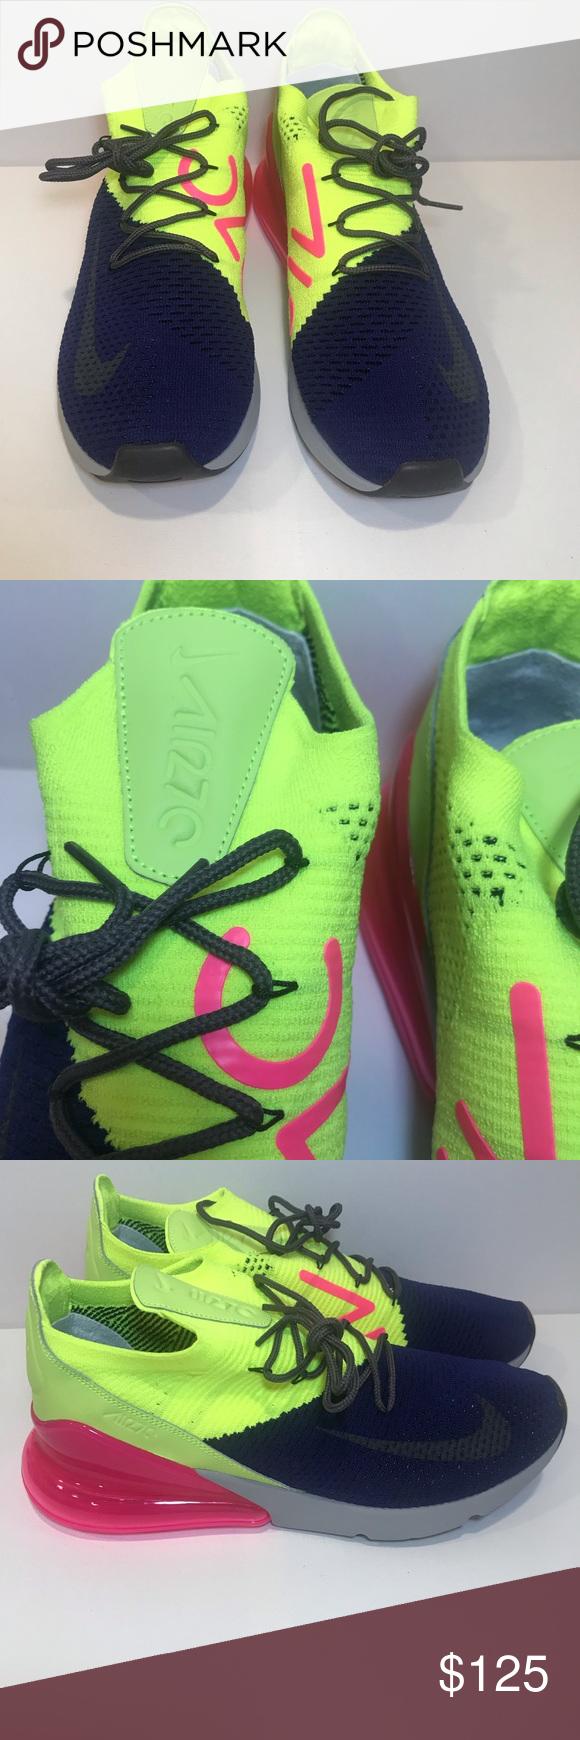 d77df3c17040 Purple Grey · Cloud · Nike Mens Air Max Flyknit 270 Size 11.5  170 New Nike  Air Max 270 Flyknit Regency